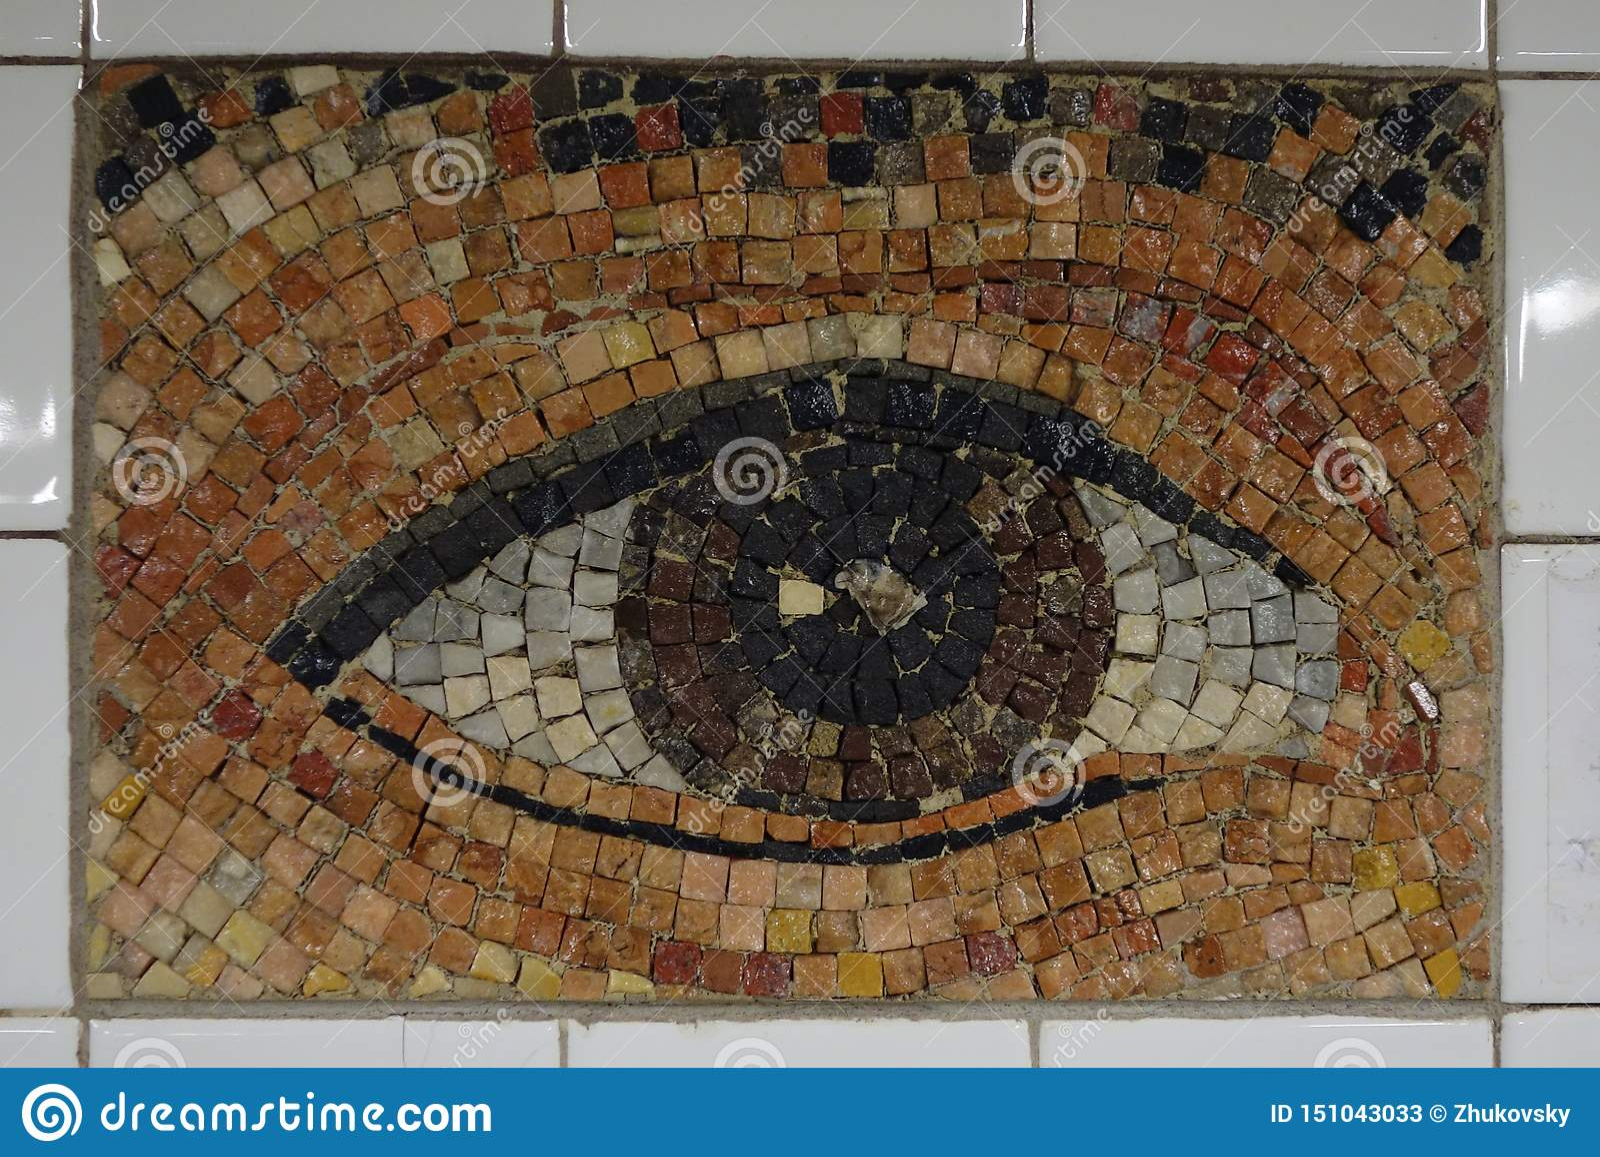 Subway Artwork `Oculus` at Chambers Street Subway station in Manhattan